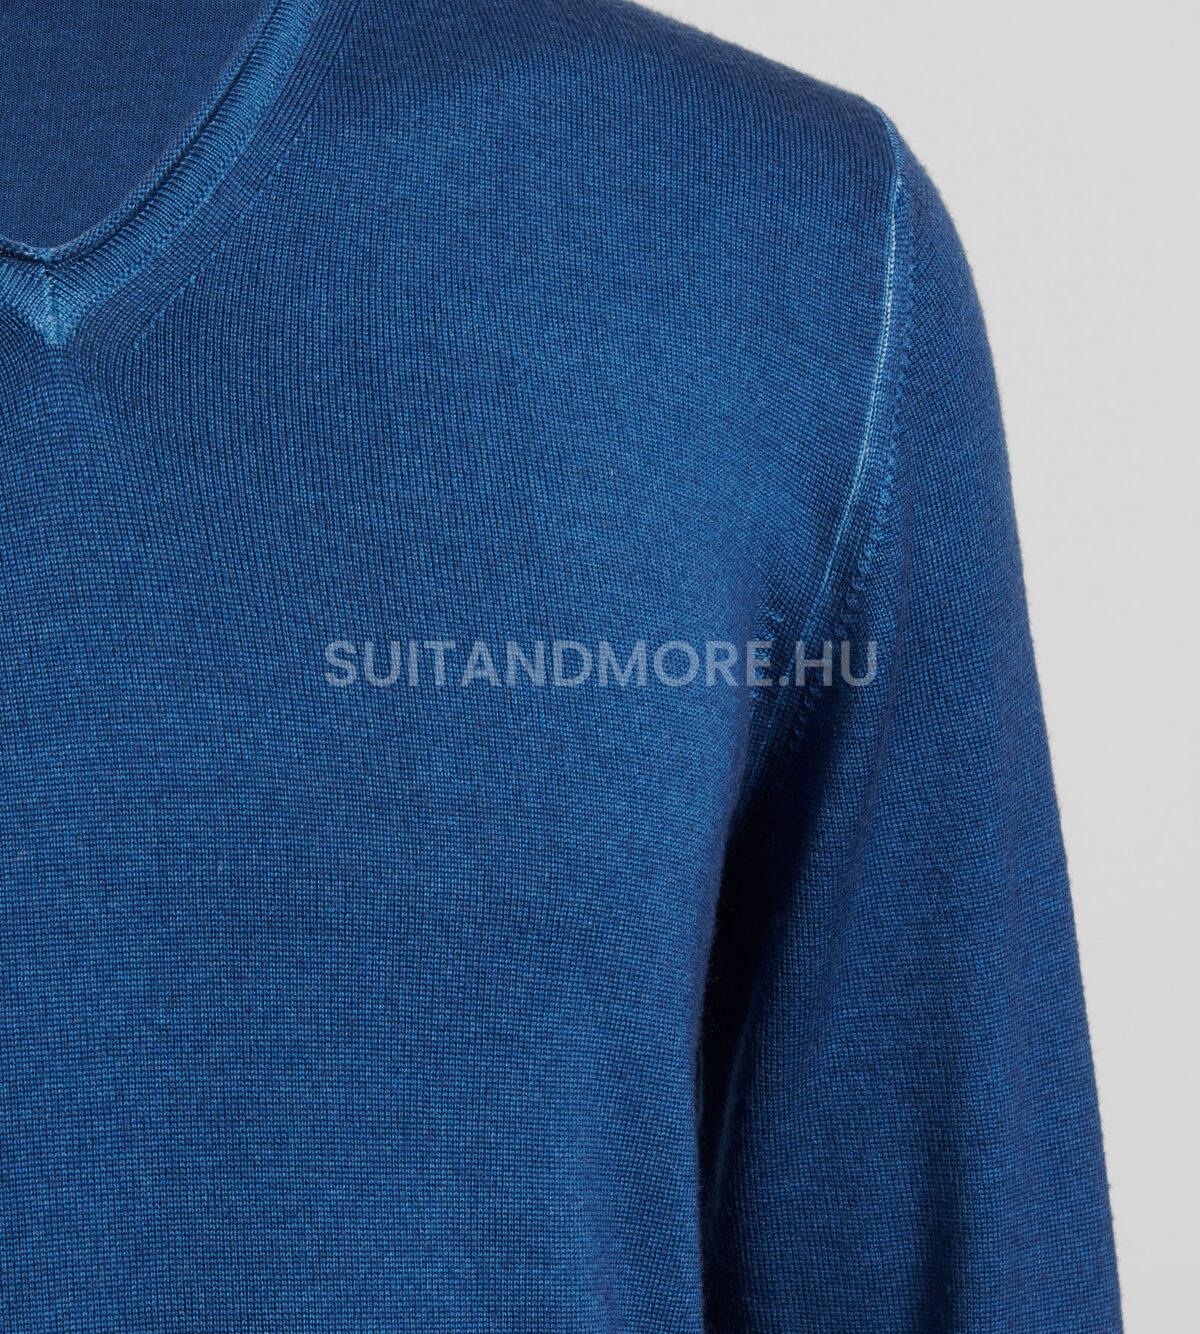 digel-kozepkek-modern-fit-v-nyaku-gyapju-pulover-fabrizio1-1-1288001-22-02